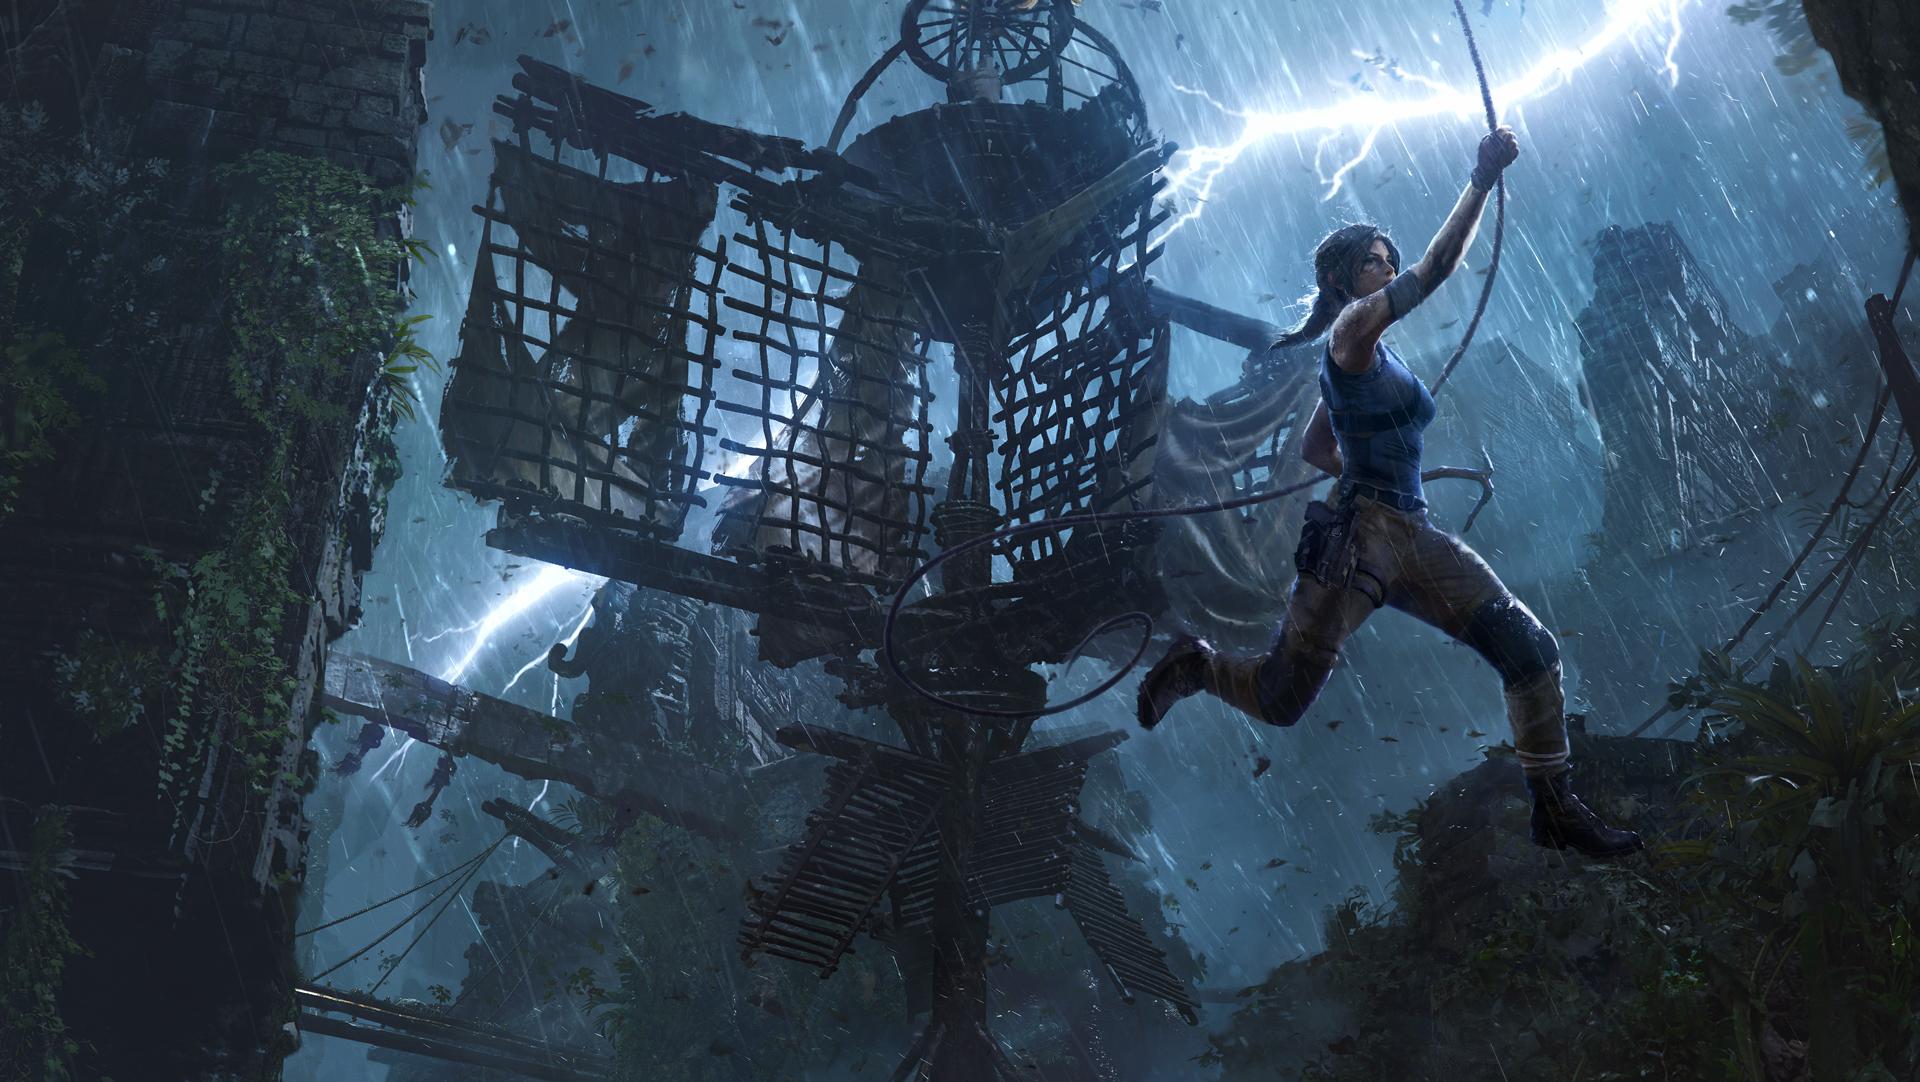 The Pillar, Tomb Raider, Shadow of the Tomb Raider, DLC, Square Enix, challenge tomb, Lara Croft